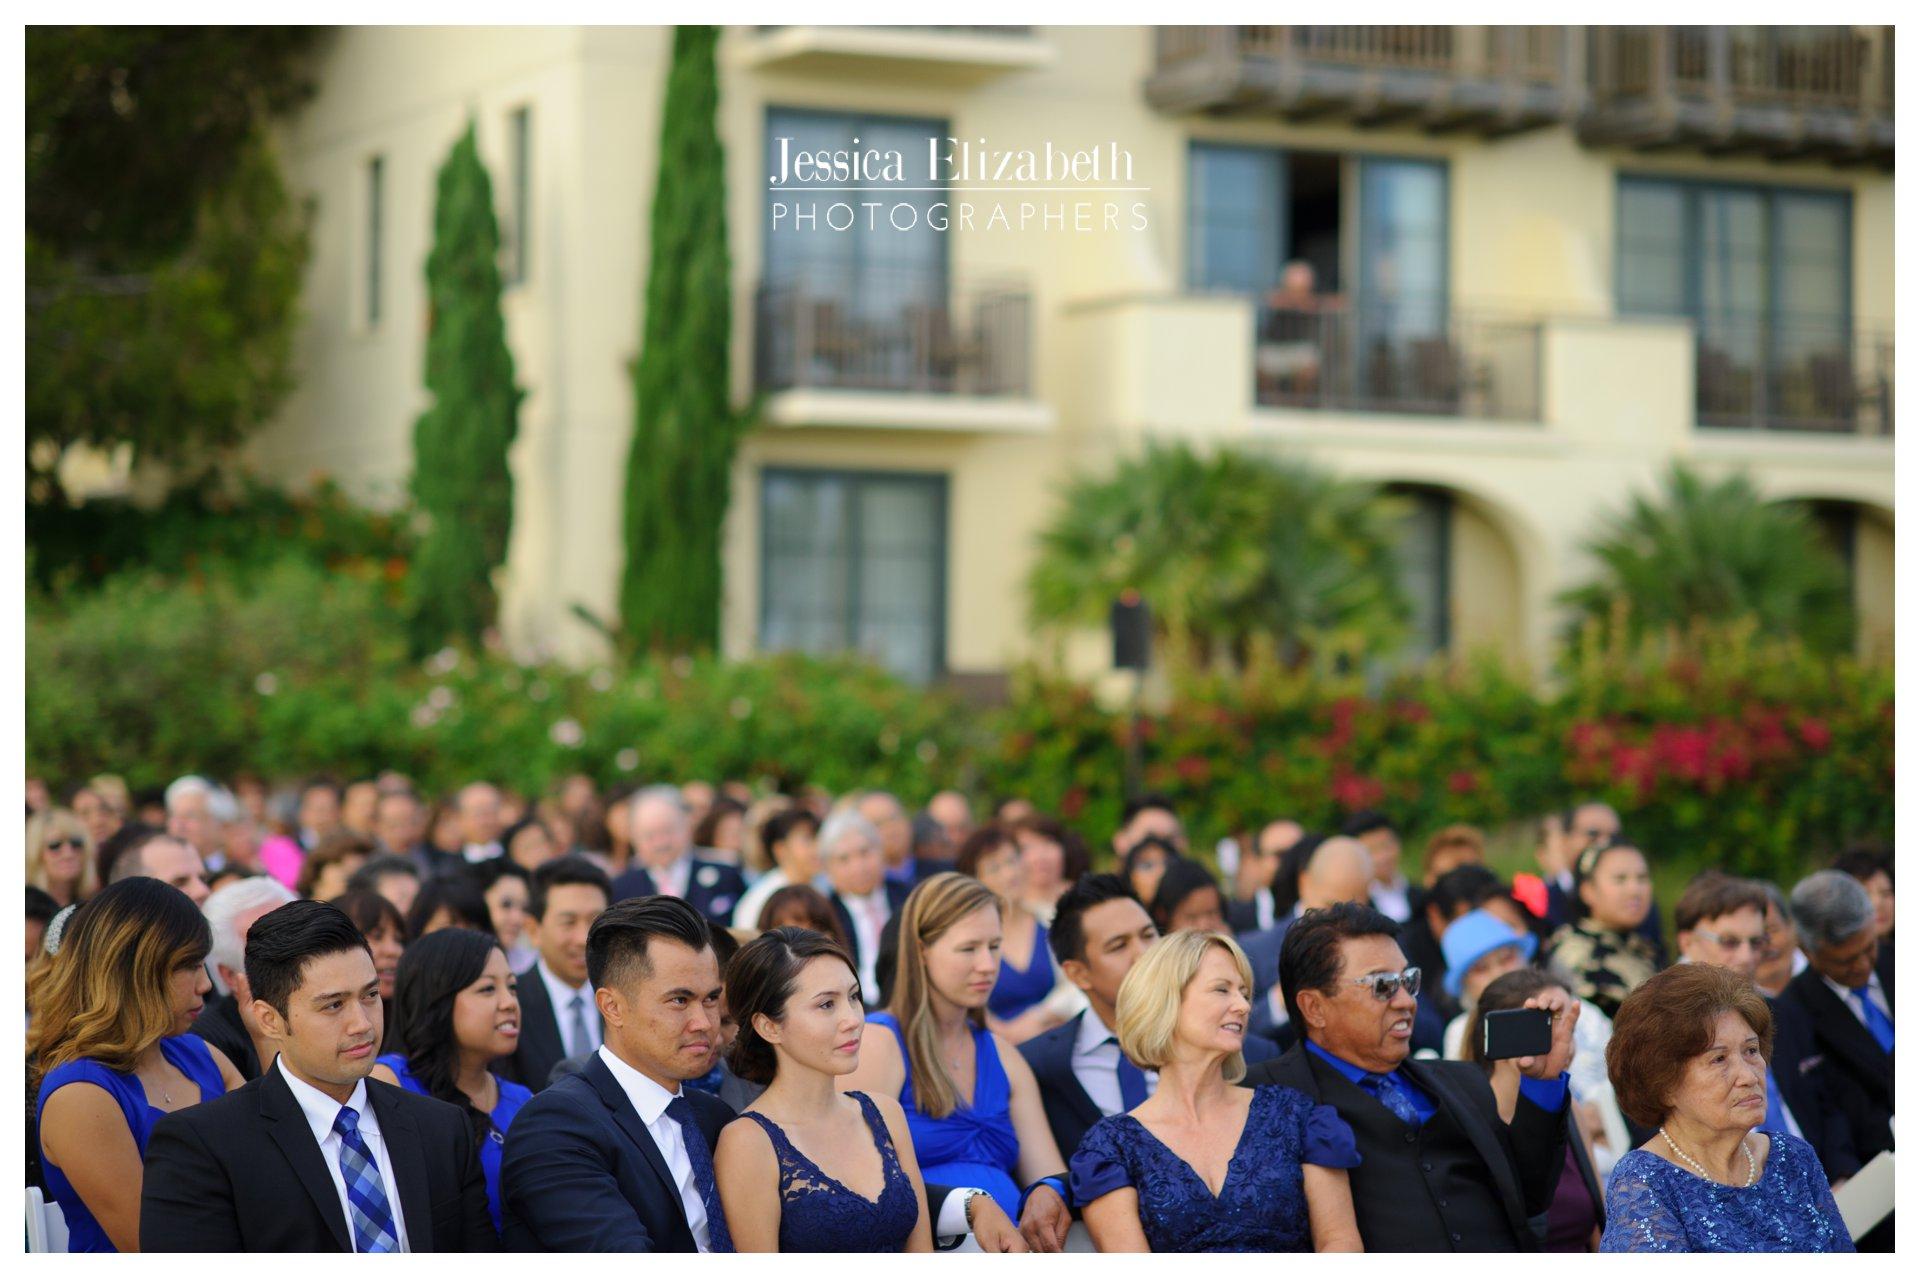 17-Terranea-Palos-Verdes-Wedding-Photography-by-Jessica-Elizabeth-w.jpg